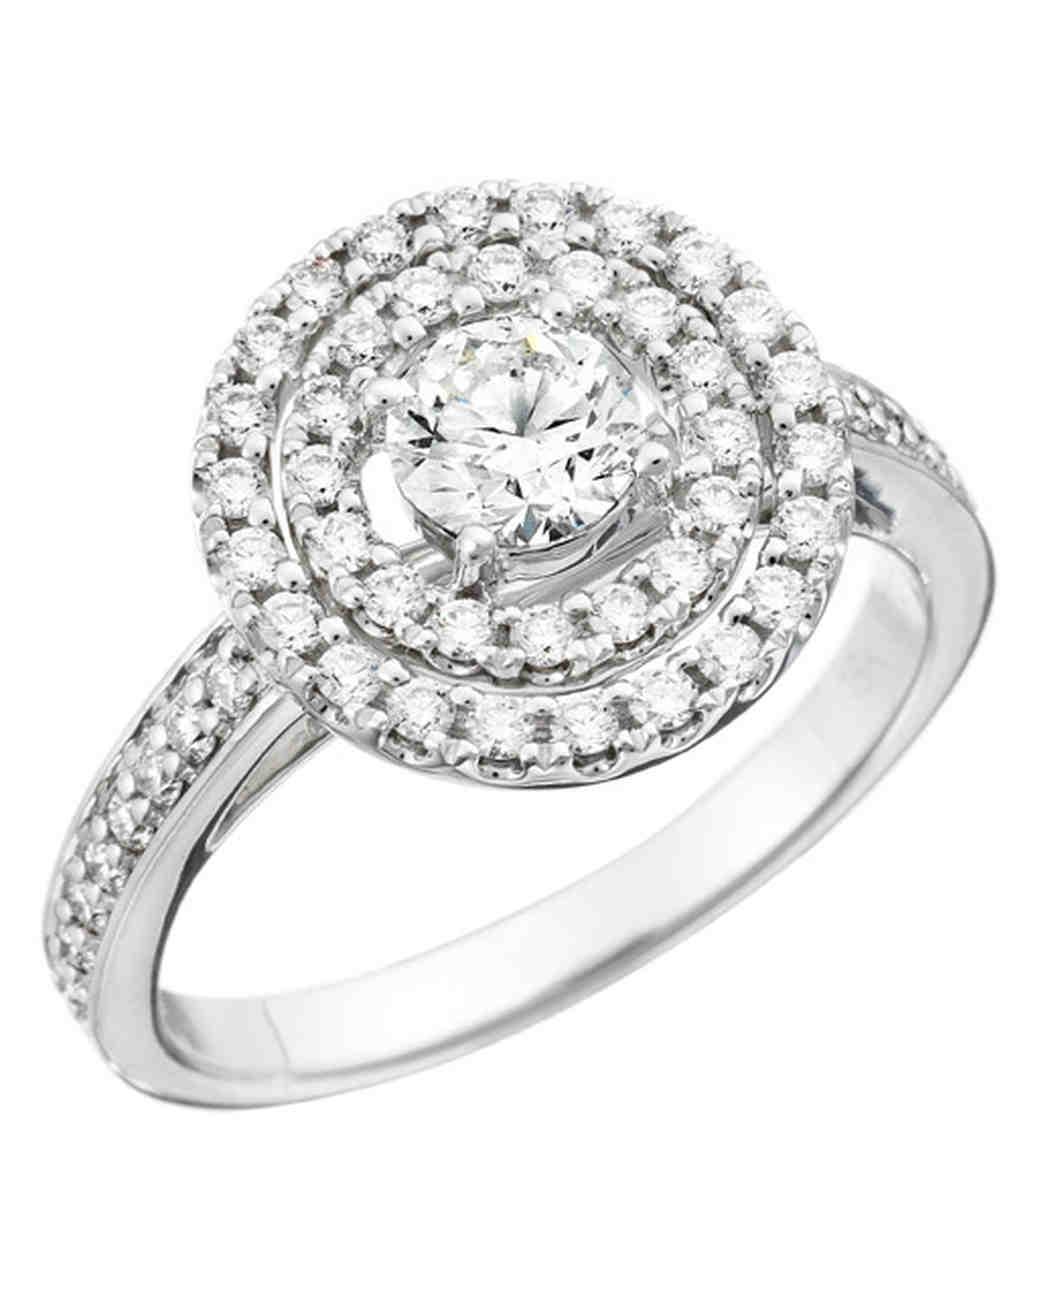 RoundCut Diamond Engagement Rings Martha Stewart Weddings